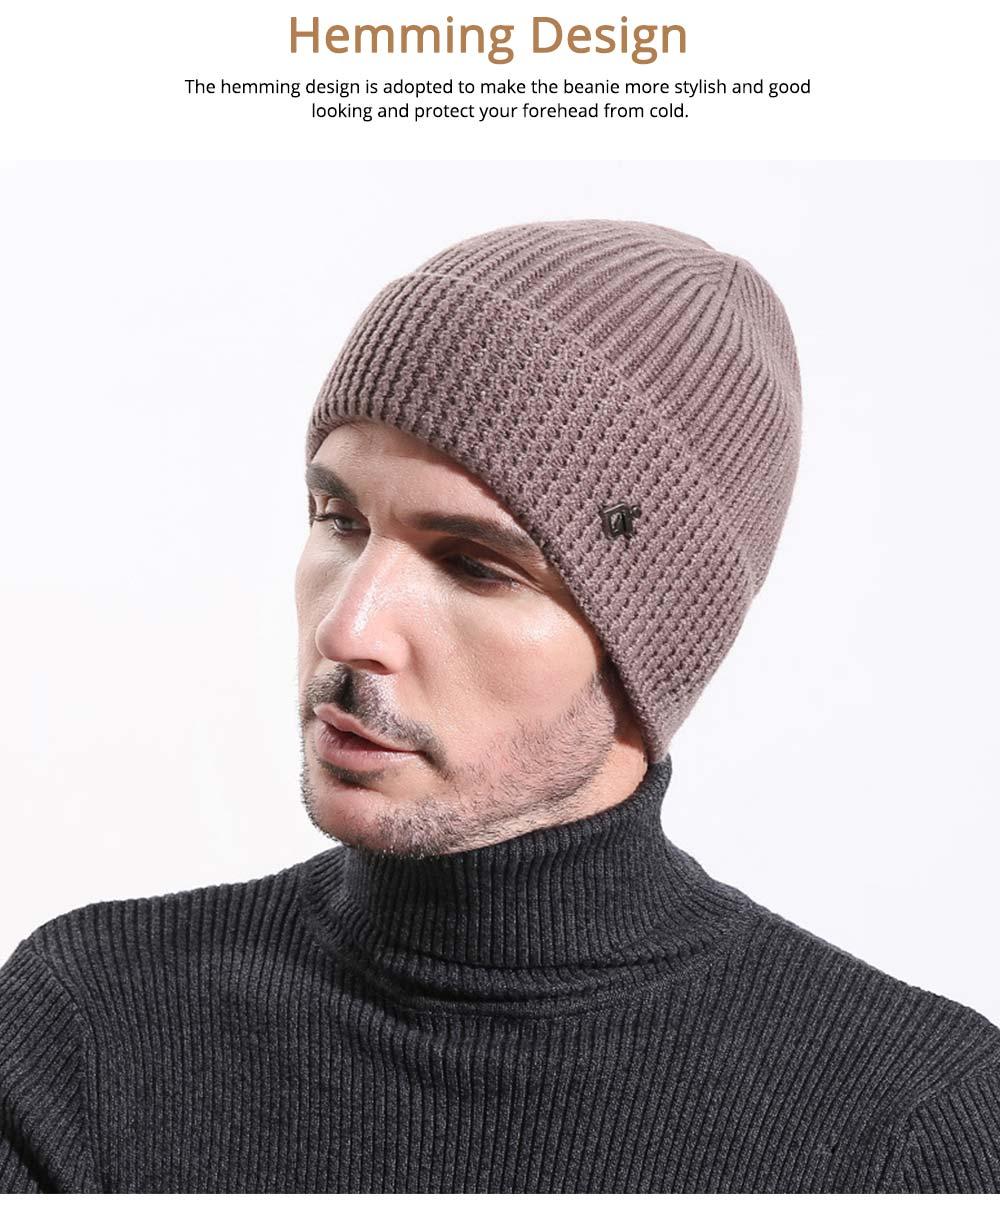 Ultra-soft Warm Thicken Angora Men Beanie, Minimalist Double-layers Winter Autumn Knitted Cap Hat 4